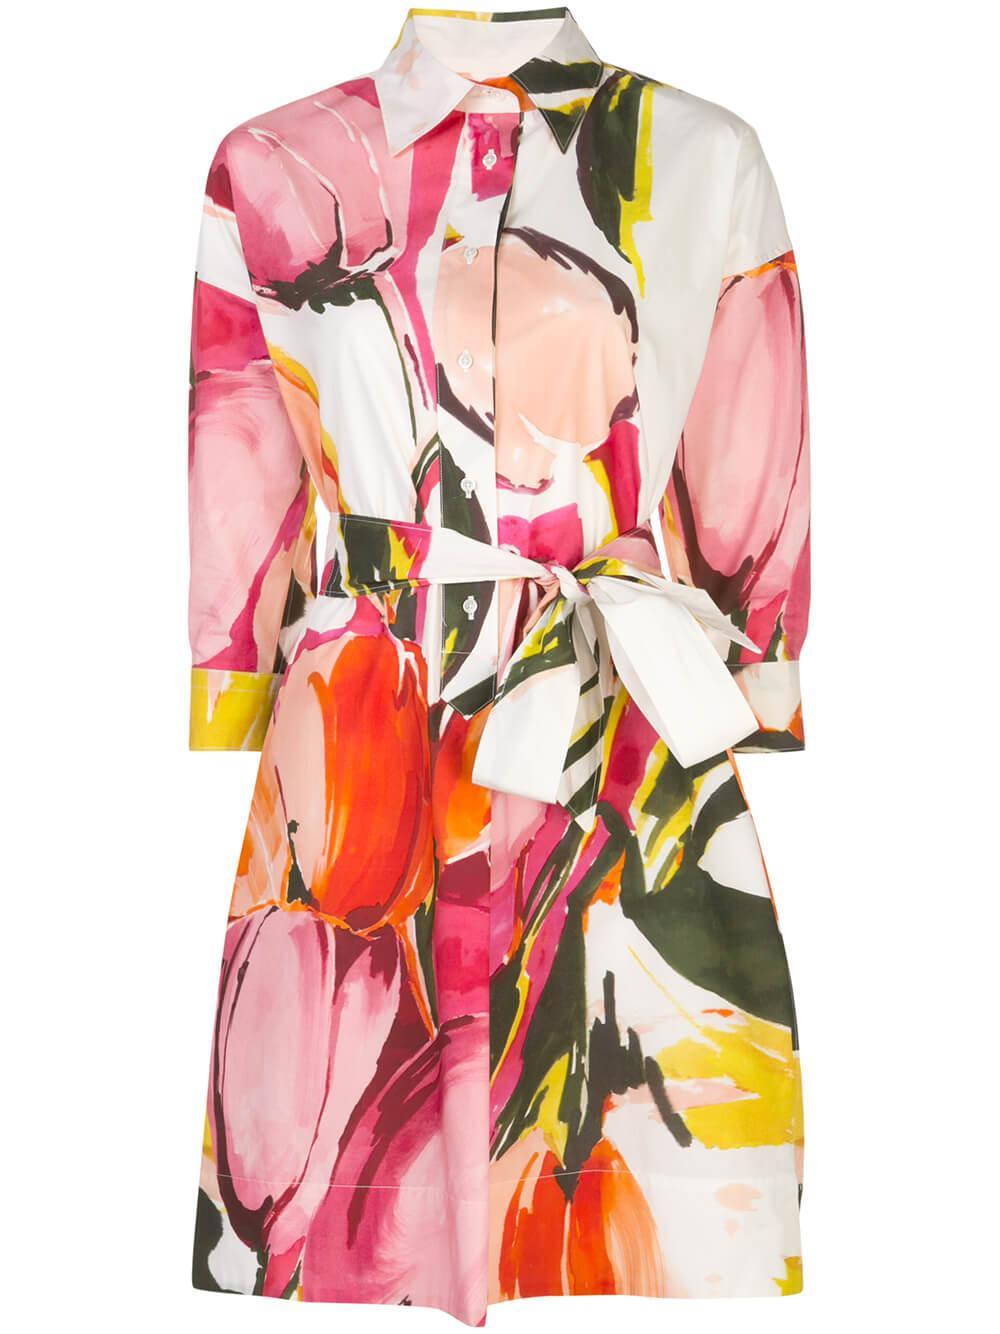 3/4 Sleeve Floral Brushstroke Shirt Dress Item # 8EKATERY-34